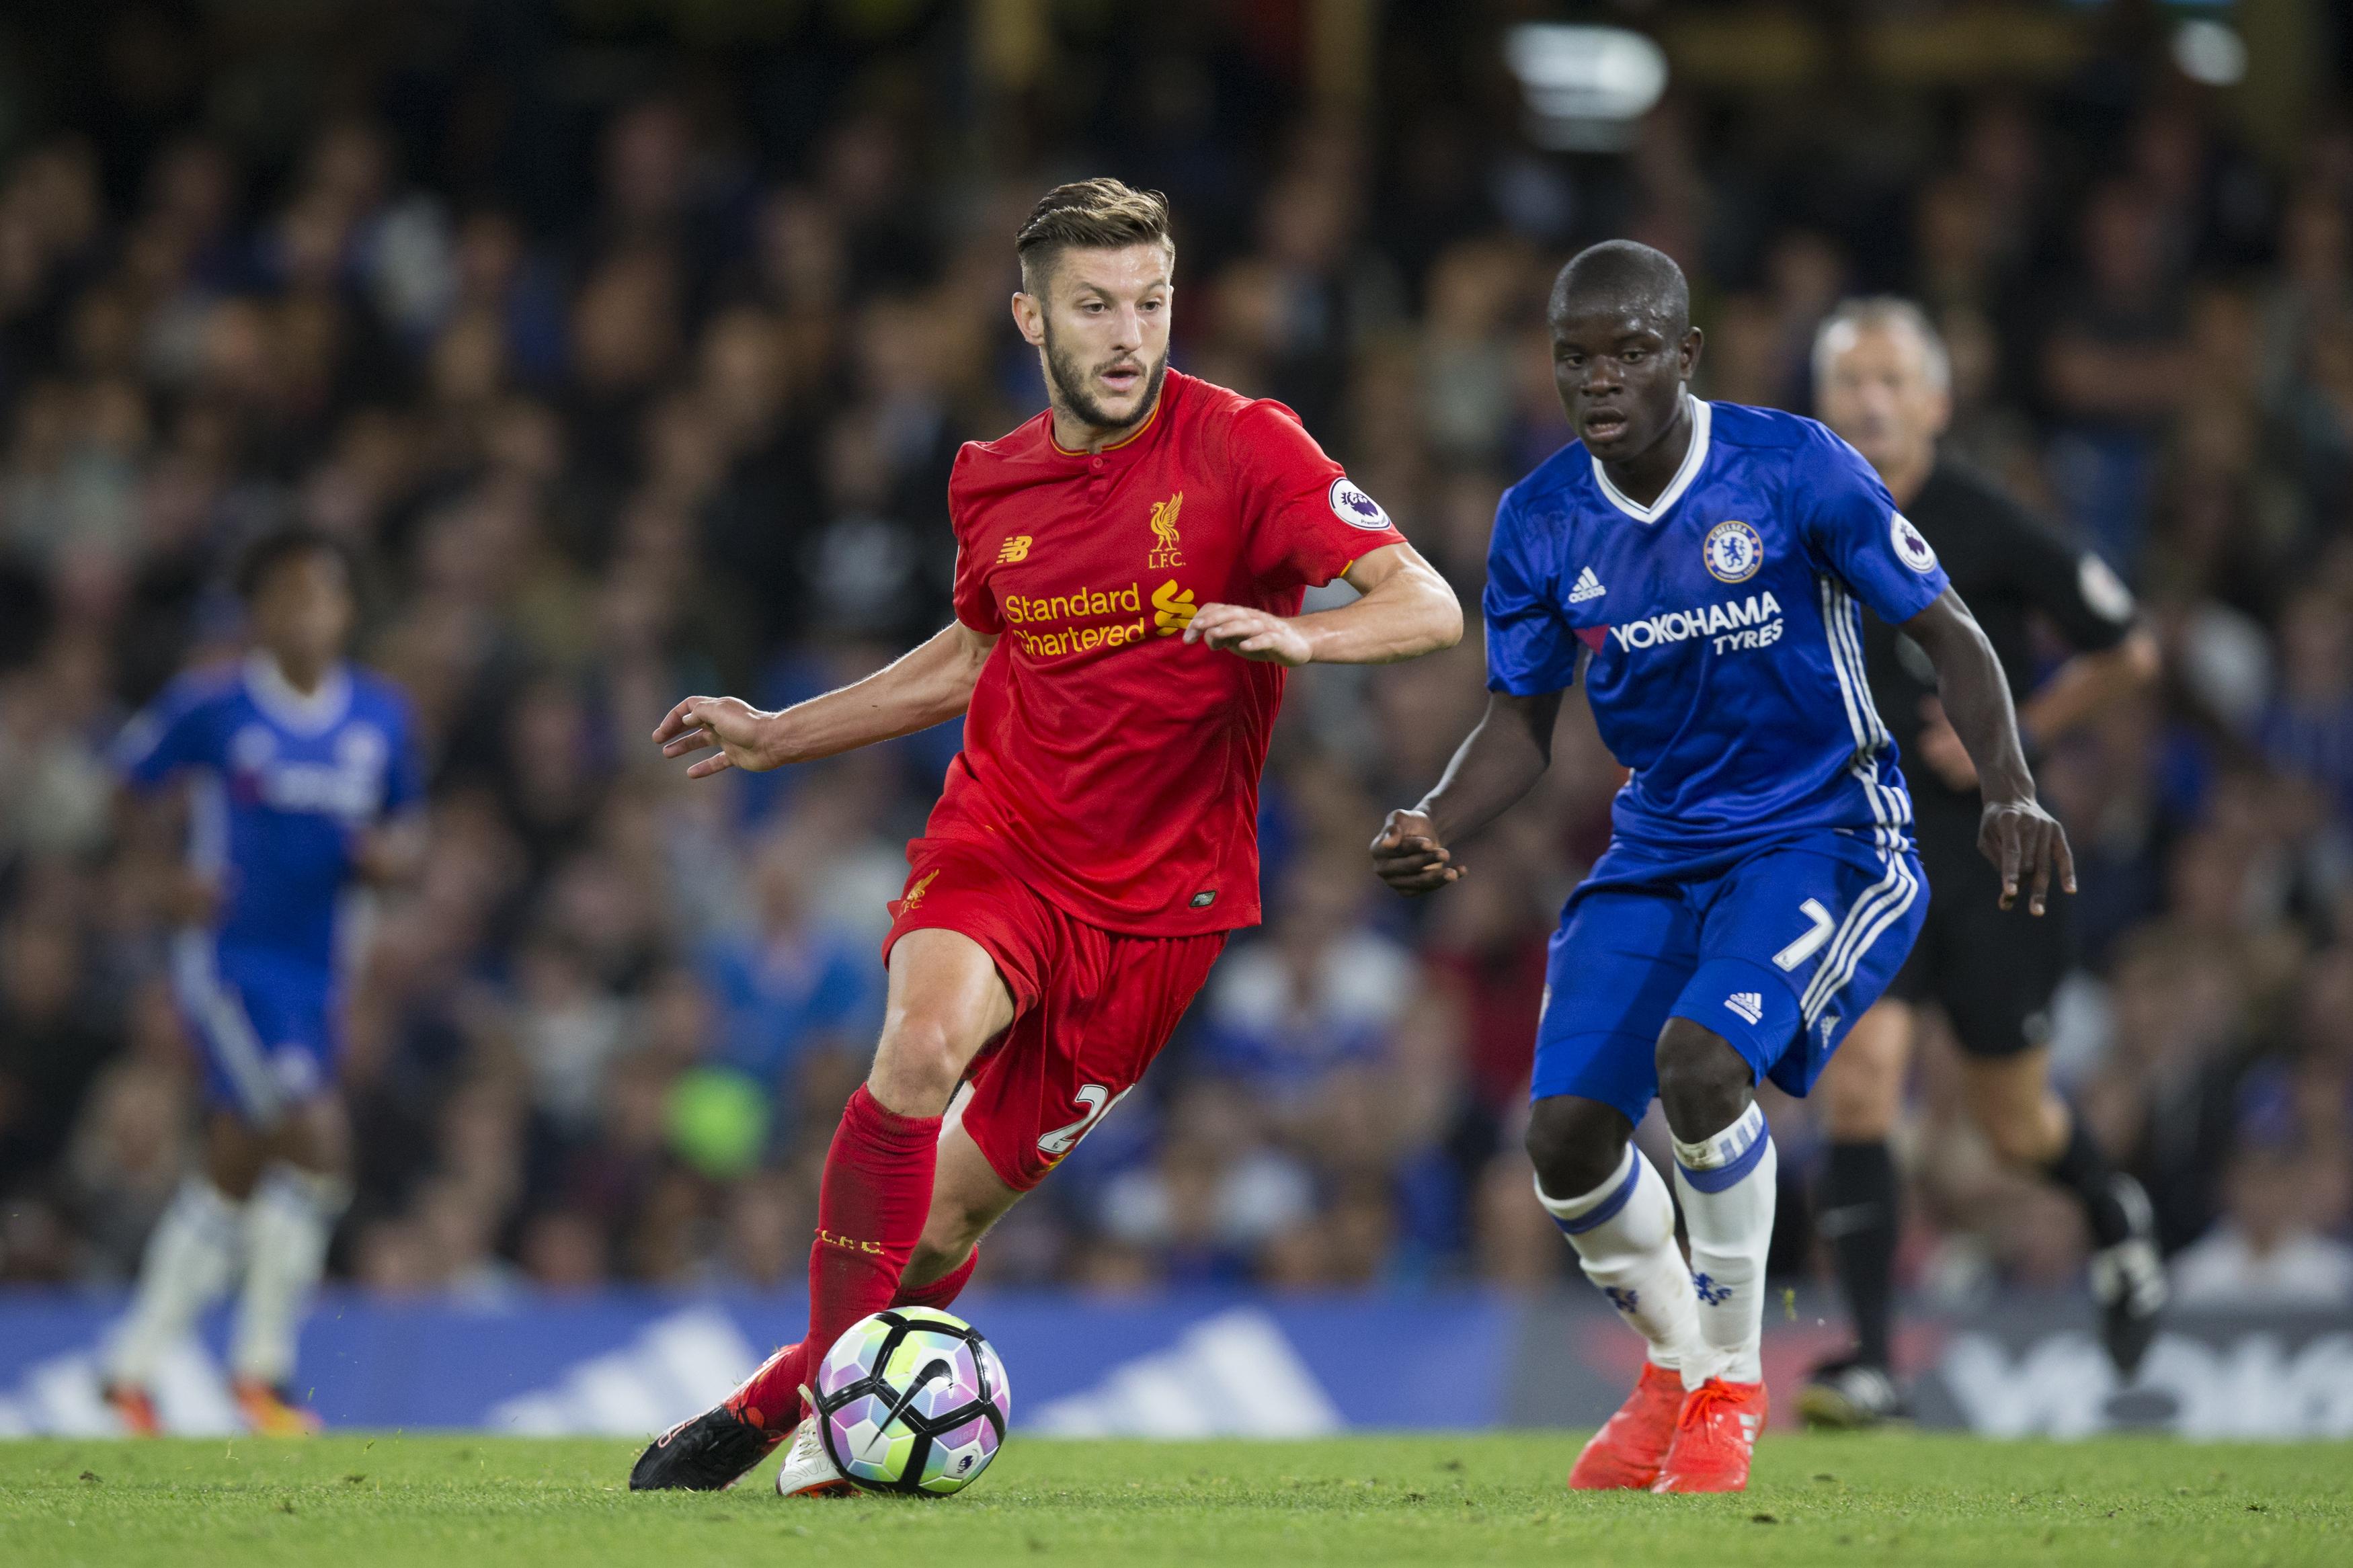 Adam Lallana discusses Liverpool's bright future